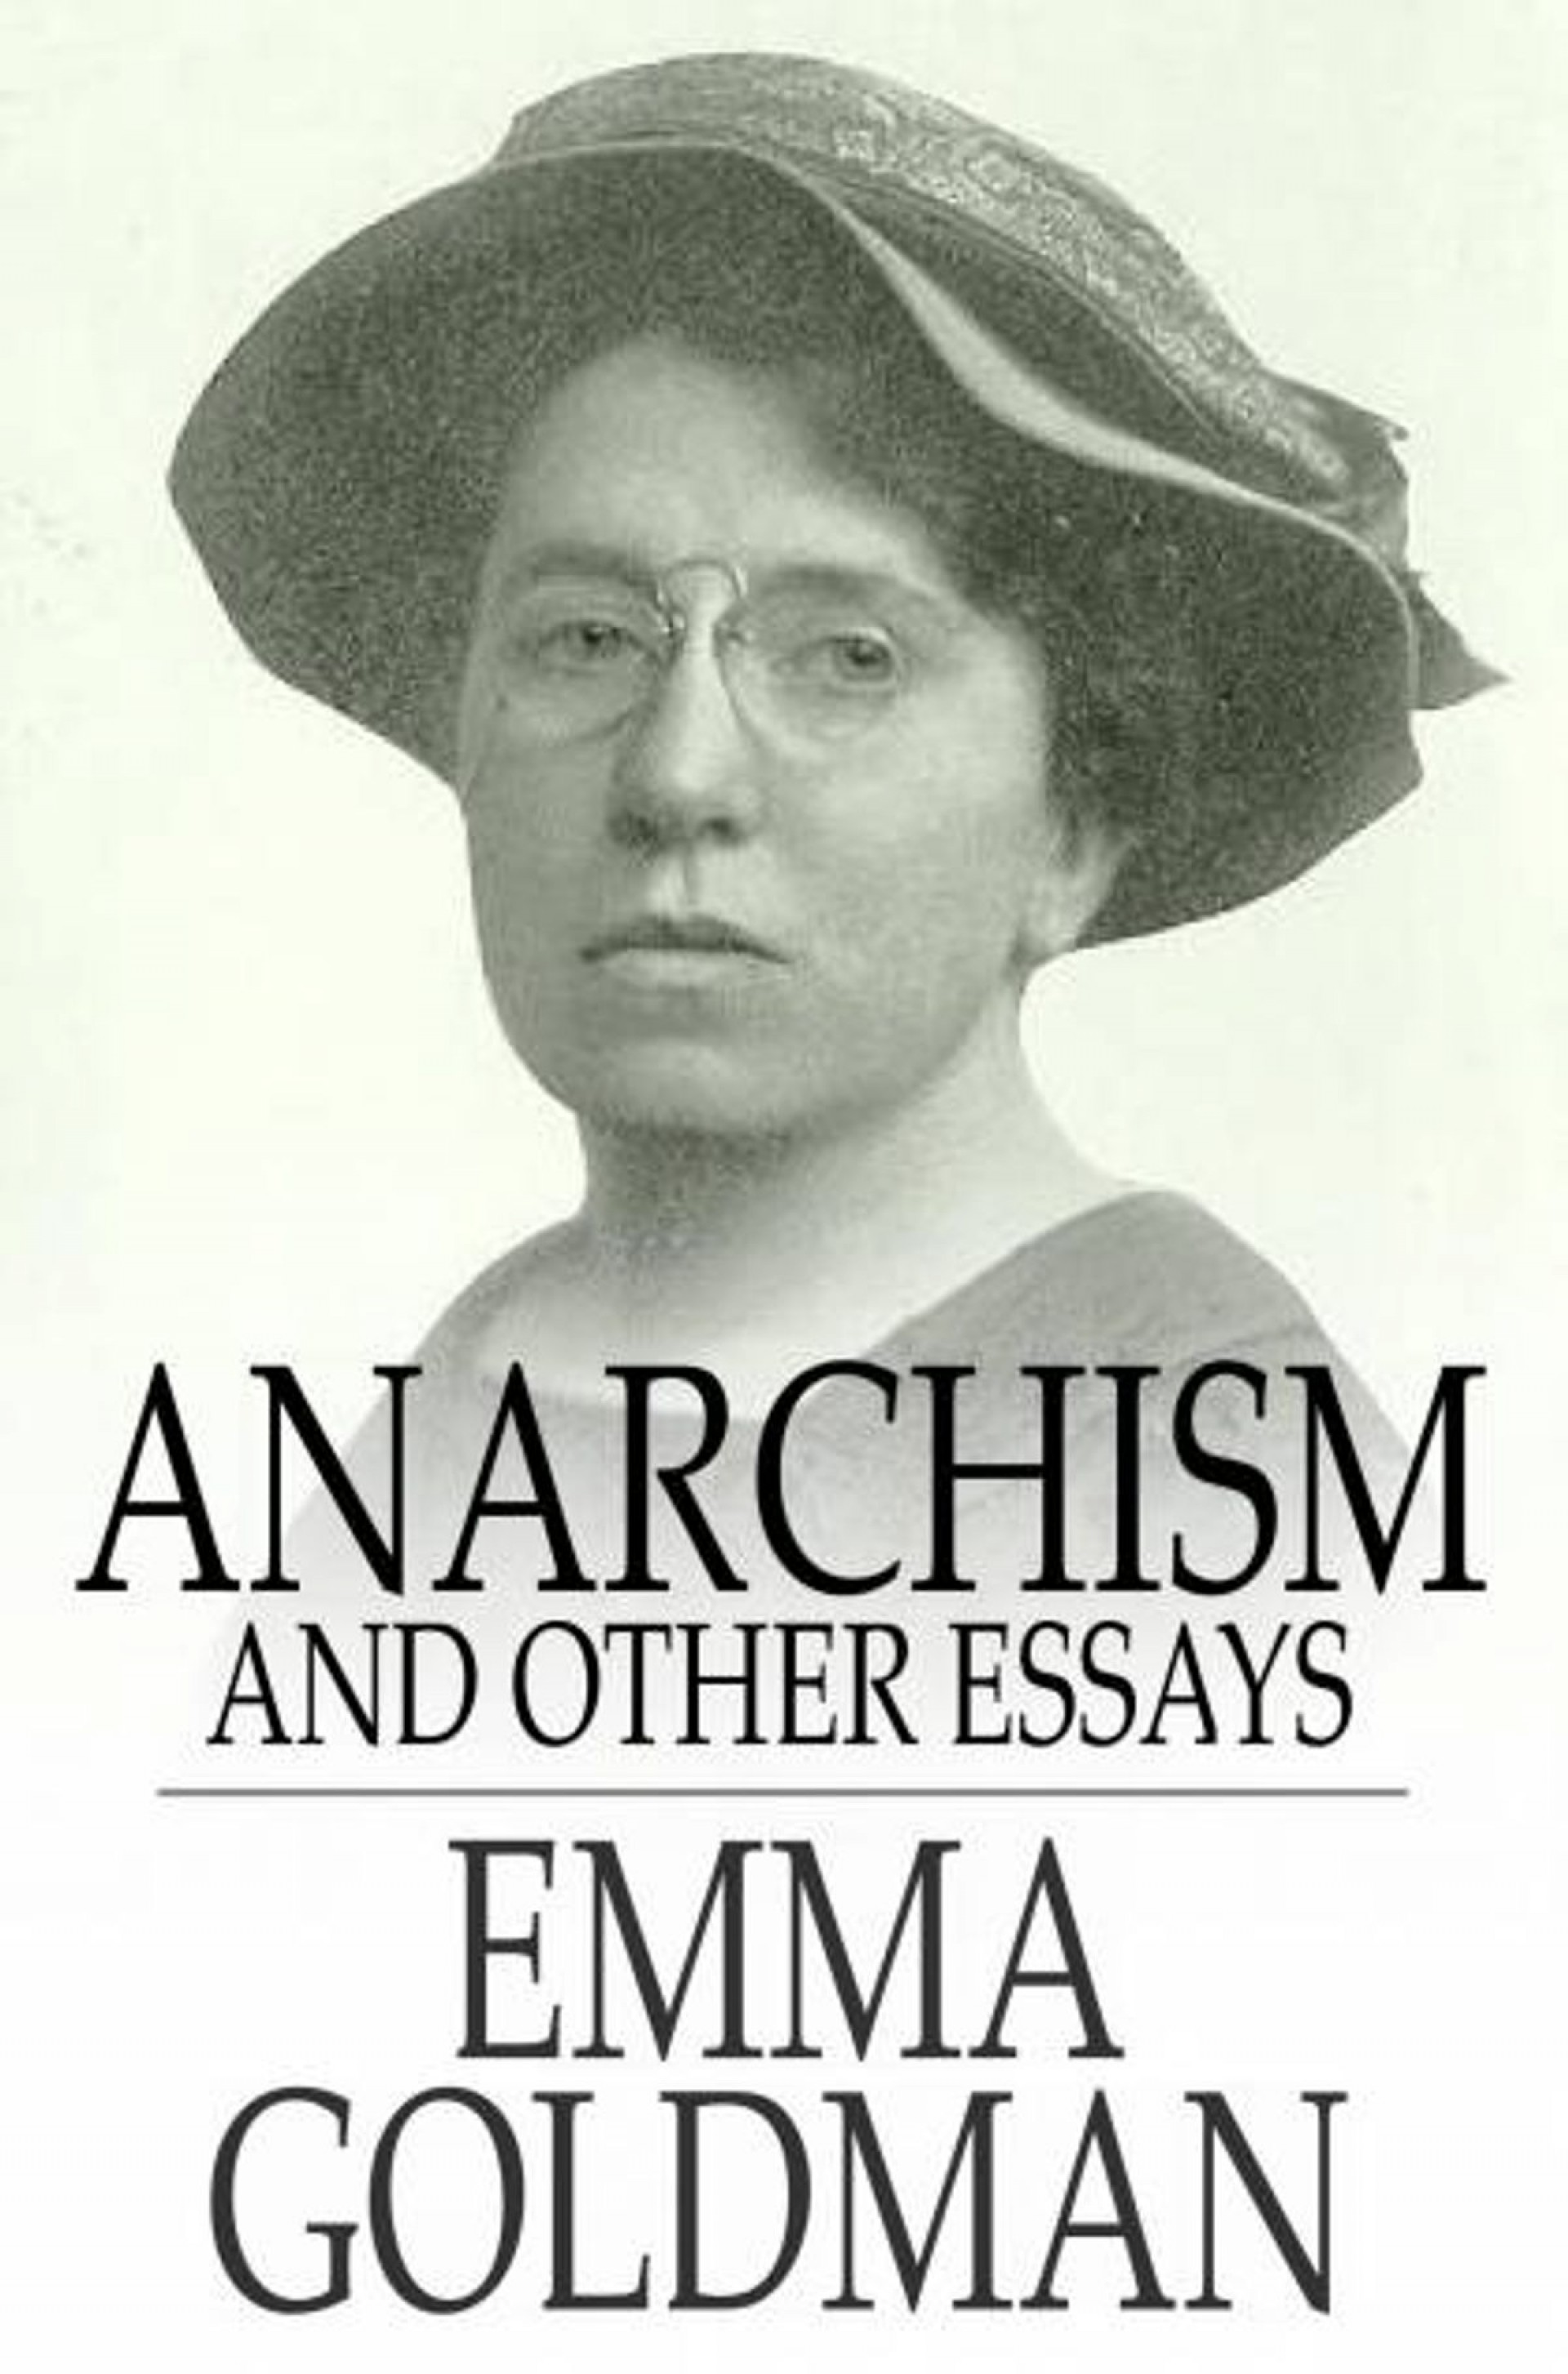 009 Anarchism And Other Essays Essay Incredible Emma Goldman Summary Pdf 1920